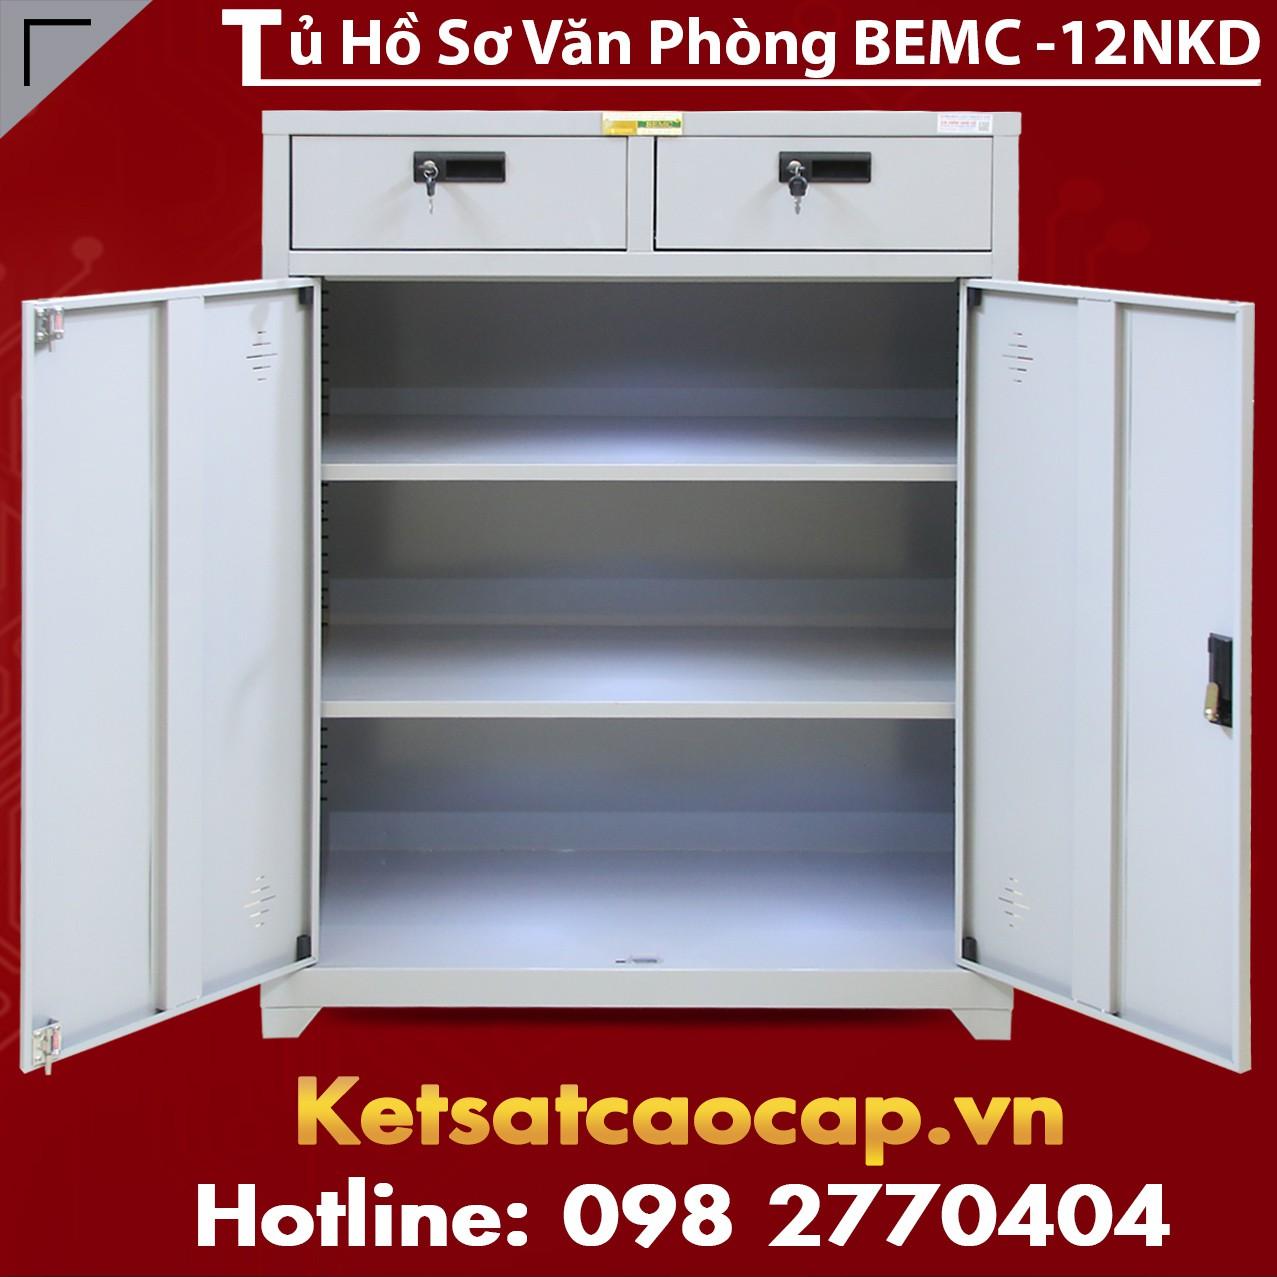 Tủ hồ sơ BEMC 12NKD